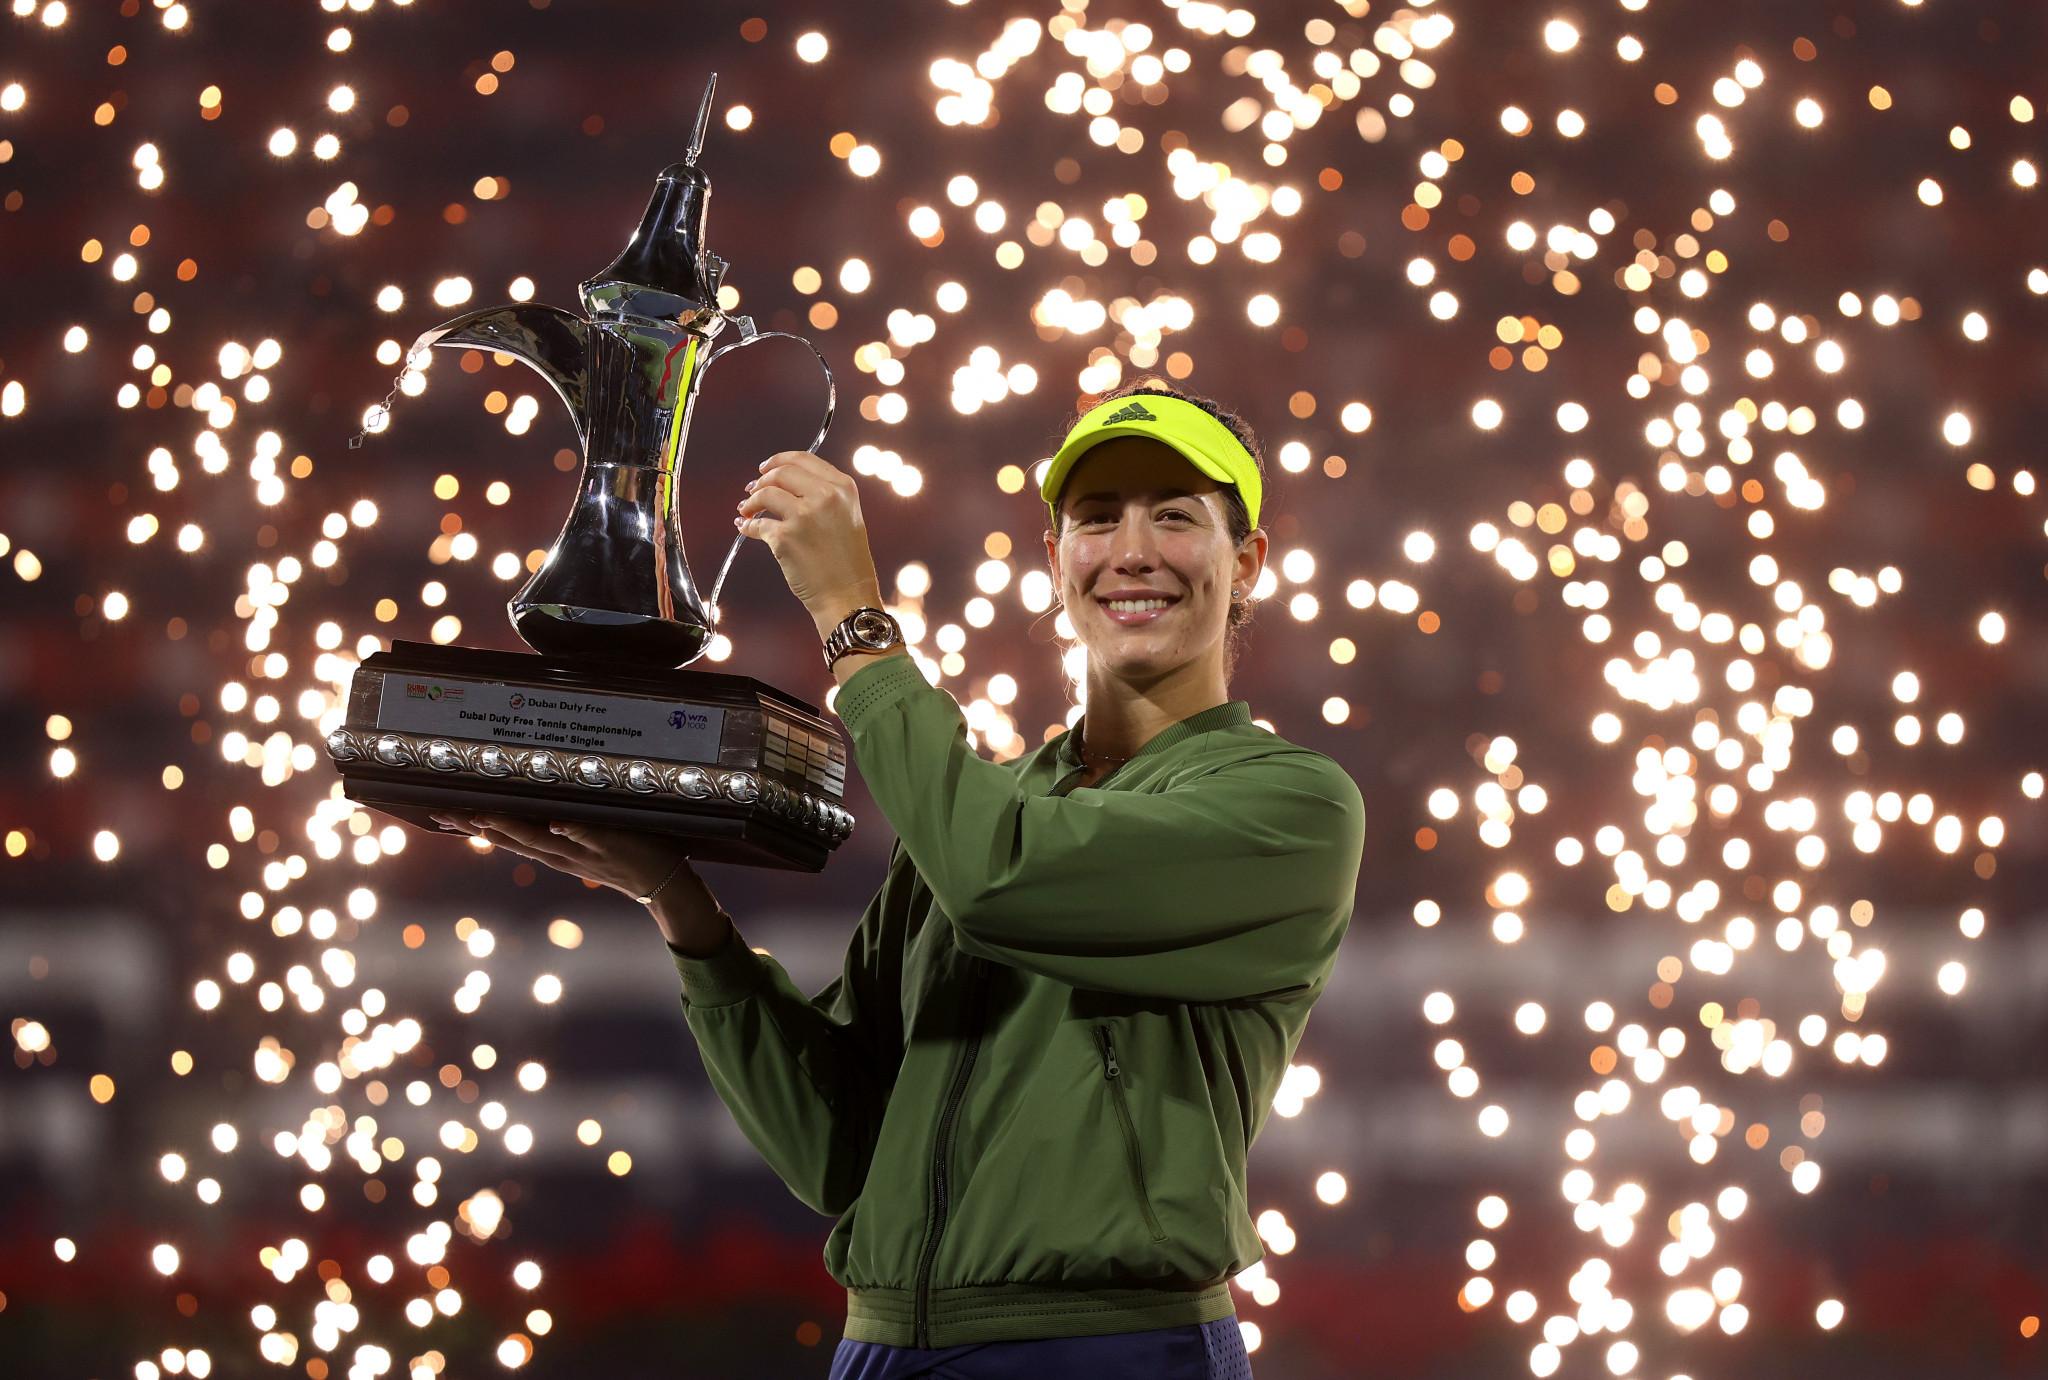 Muguruza wins WTA Dubai Tennis Championships after straight sets win over Krejcikova